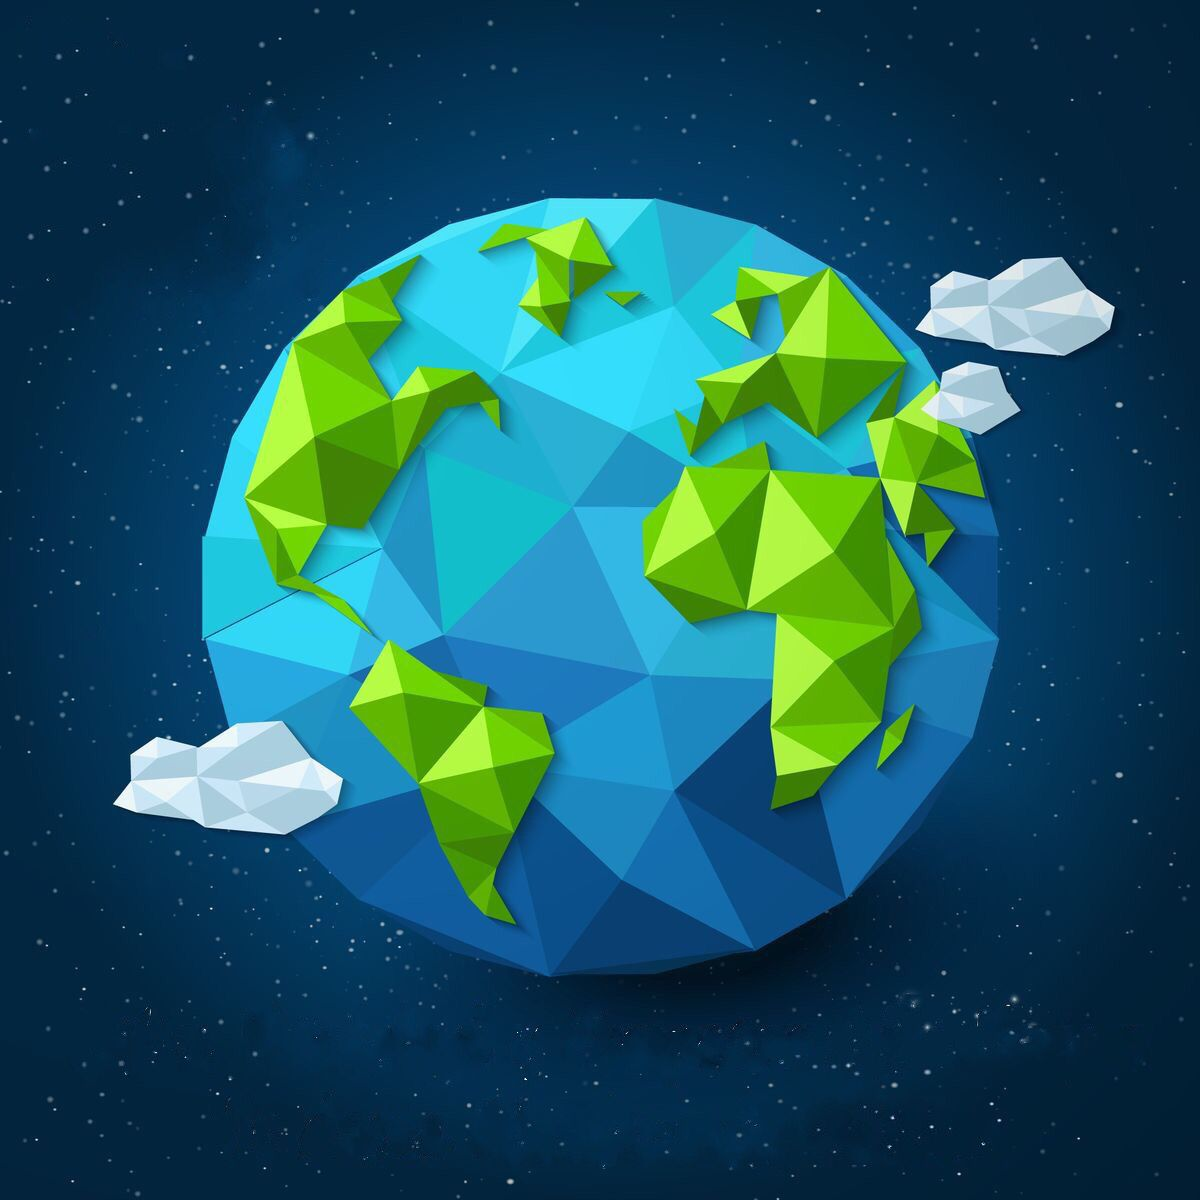 1200x1200 Planeta Tierra De Origami Low Poly In 2018 Low